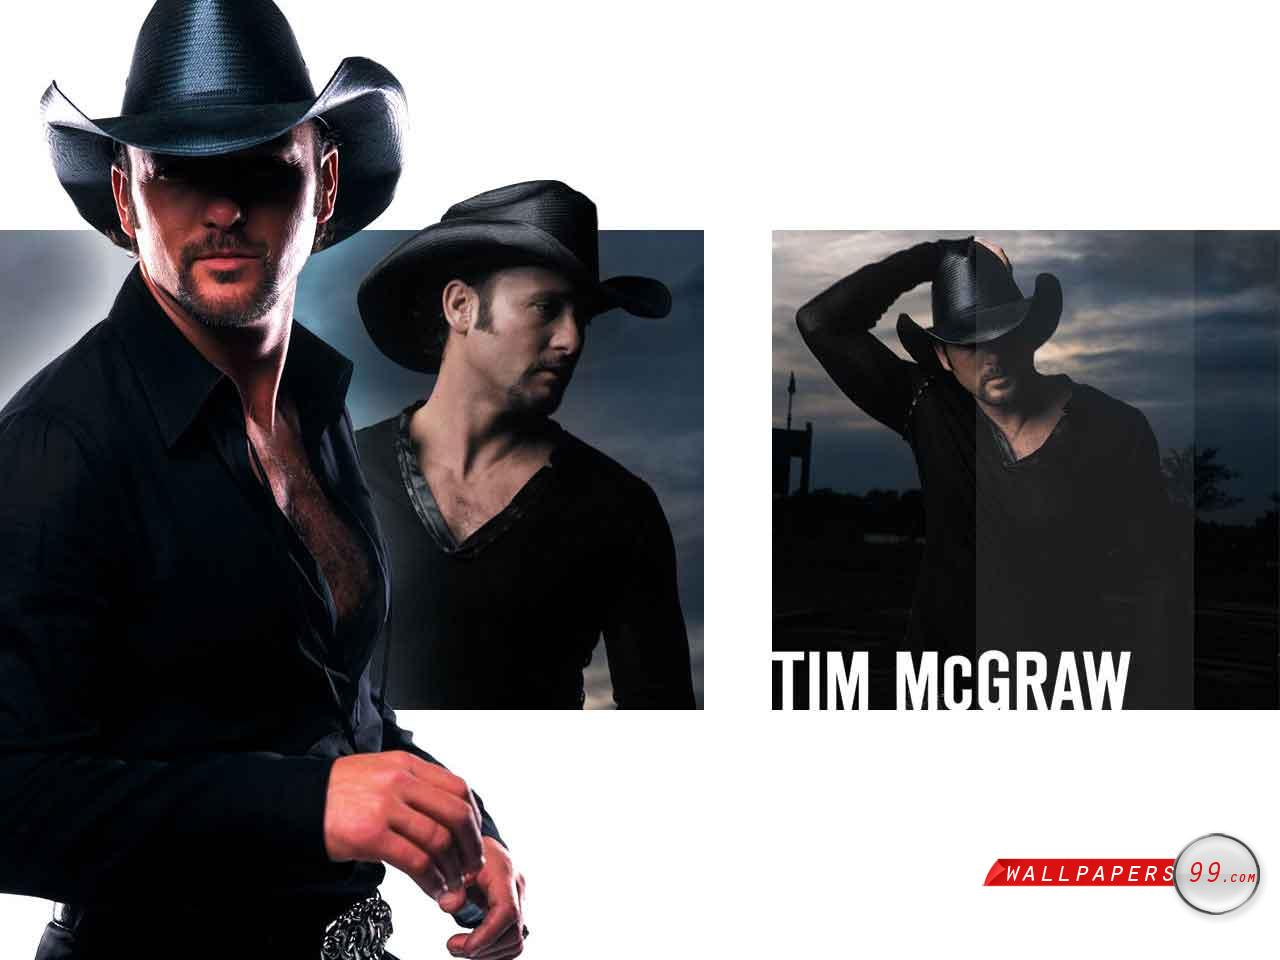 Tim McGraw Wallpaper Picture Image 1280x960 16963 1280x960